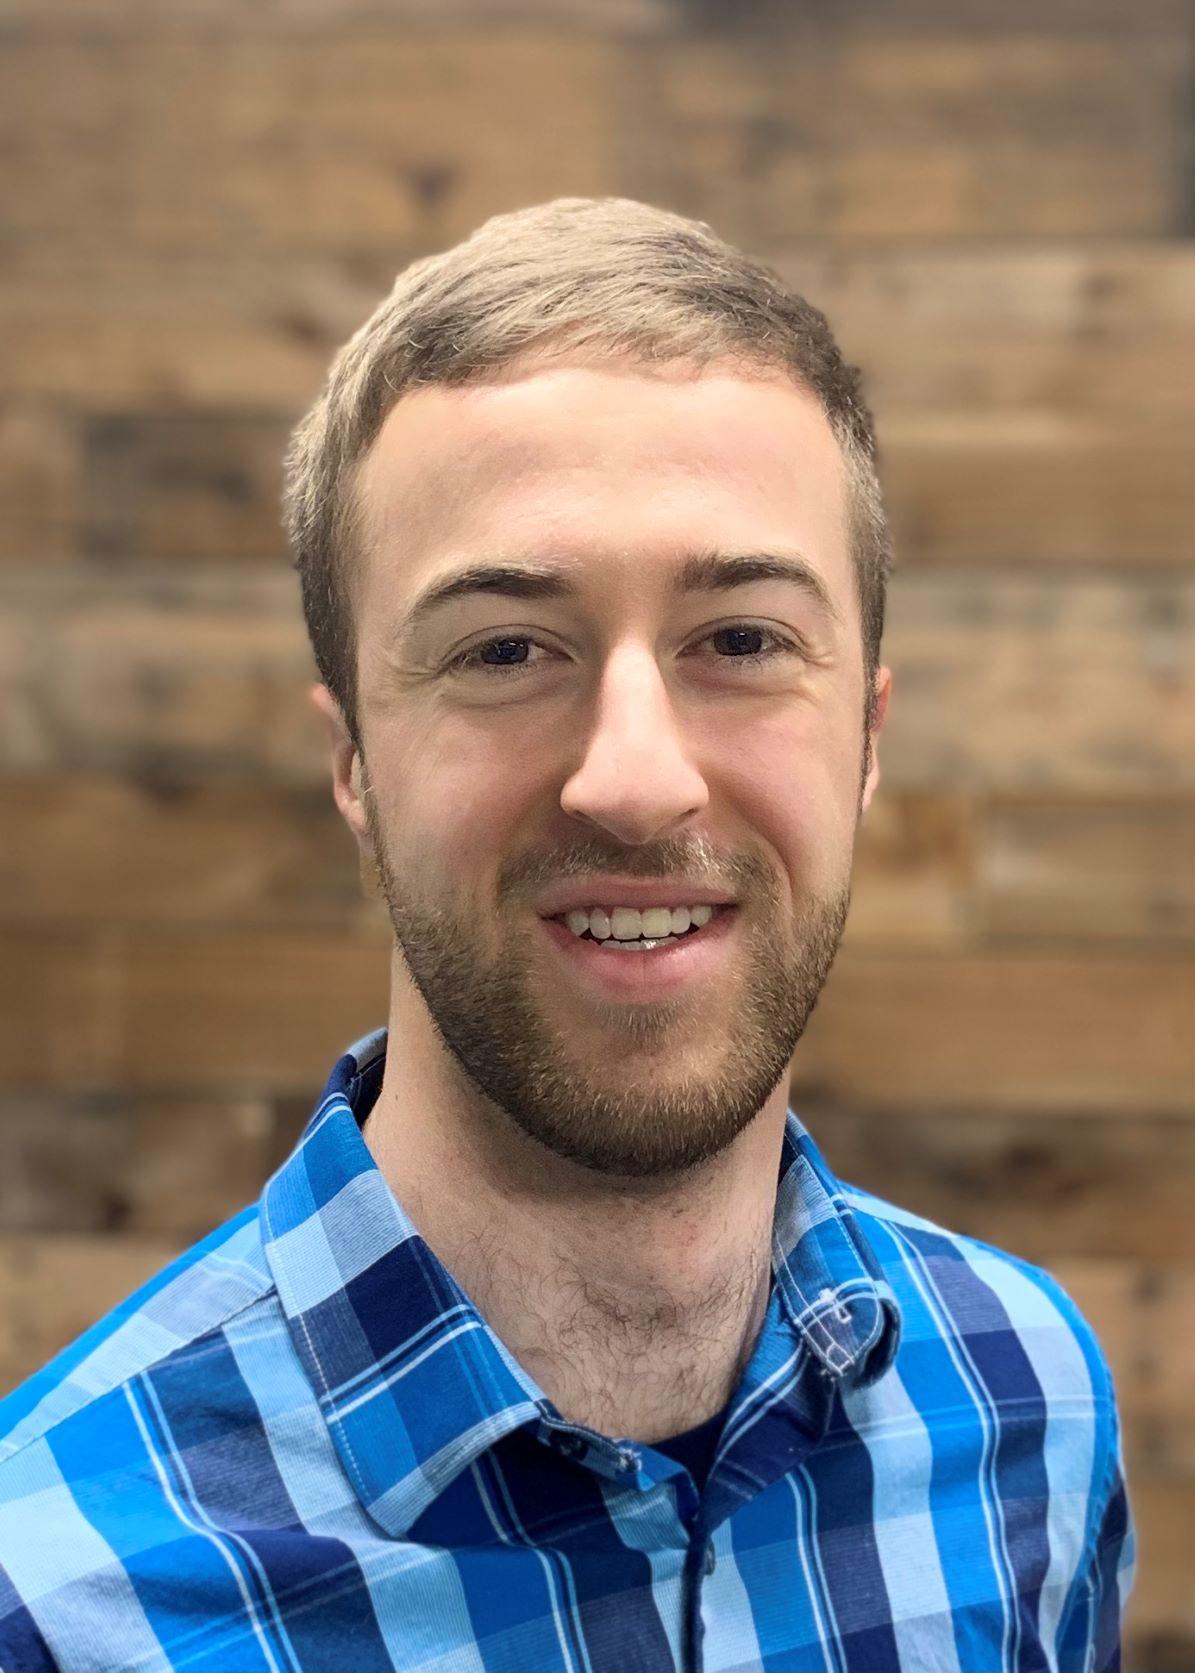 Photo of Grant Haselhorst, Designer at Schaeffer Electric